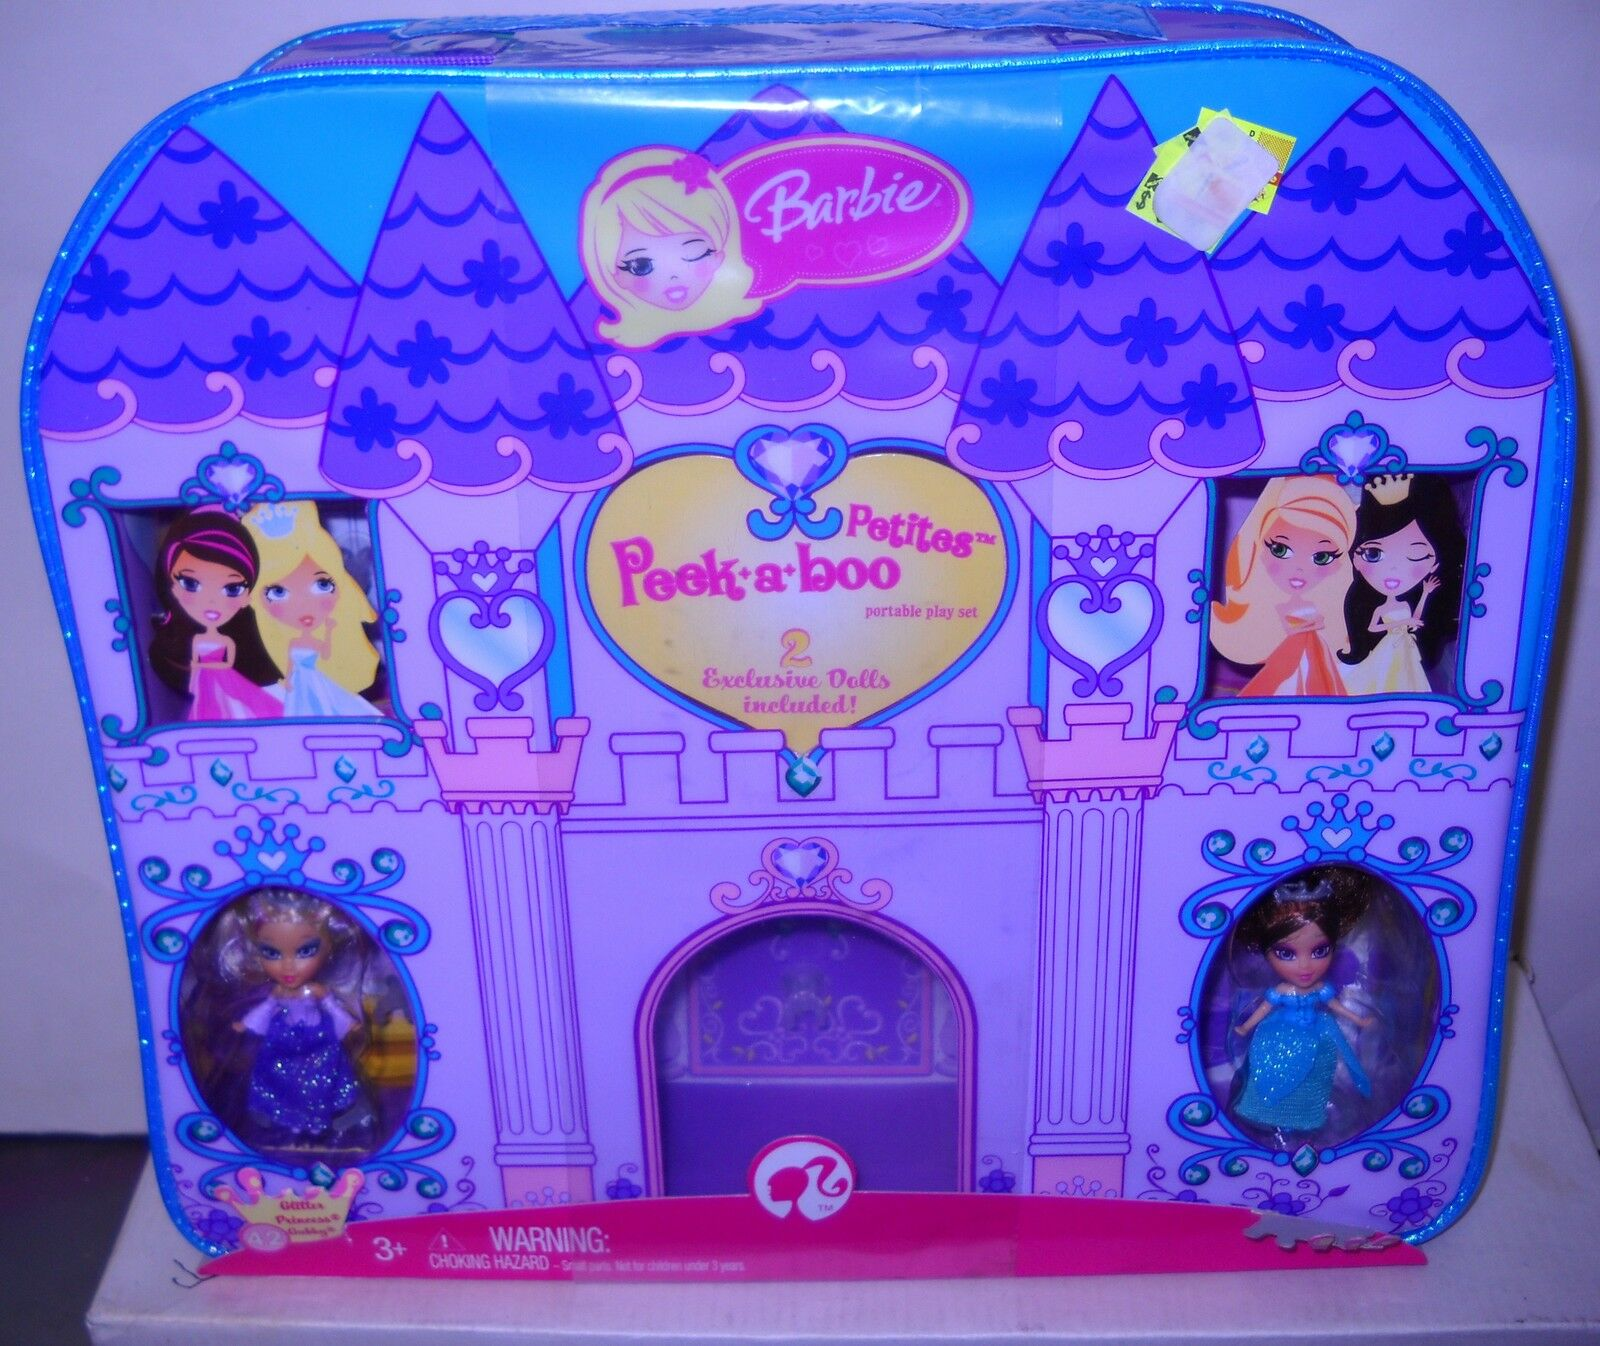 Nuevo En Caja Mattel Barbie Peek A Boo Petites Playset & 2 Muñecas &